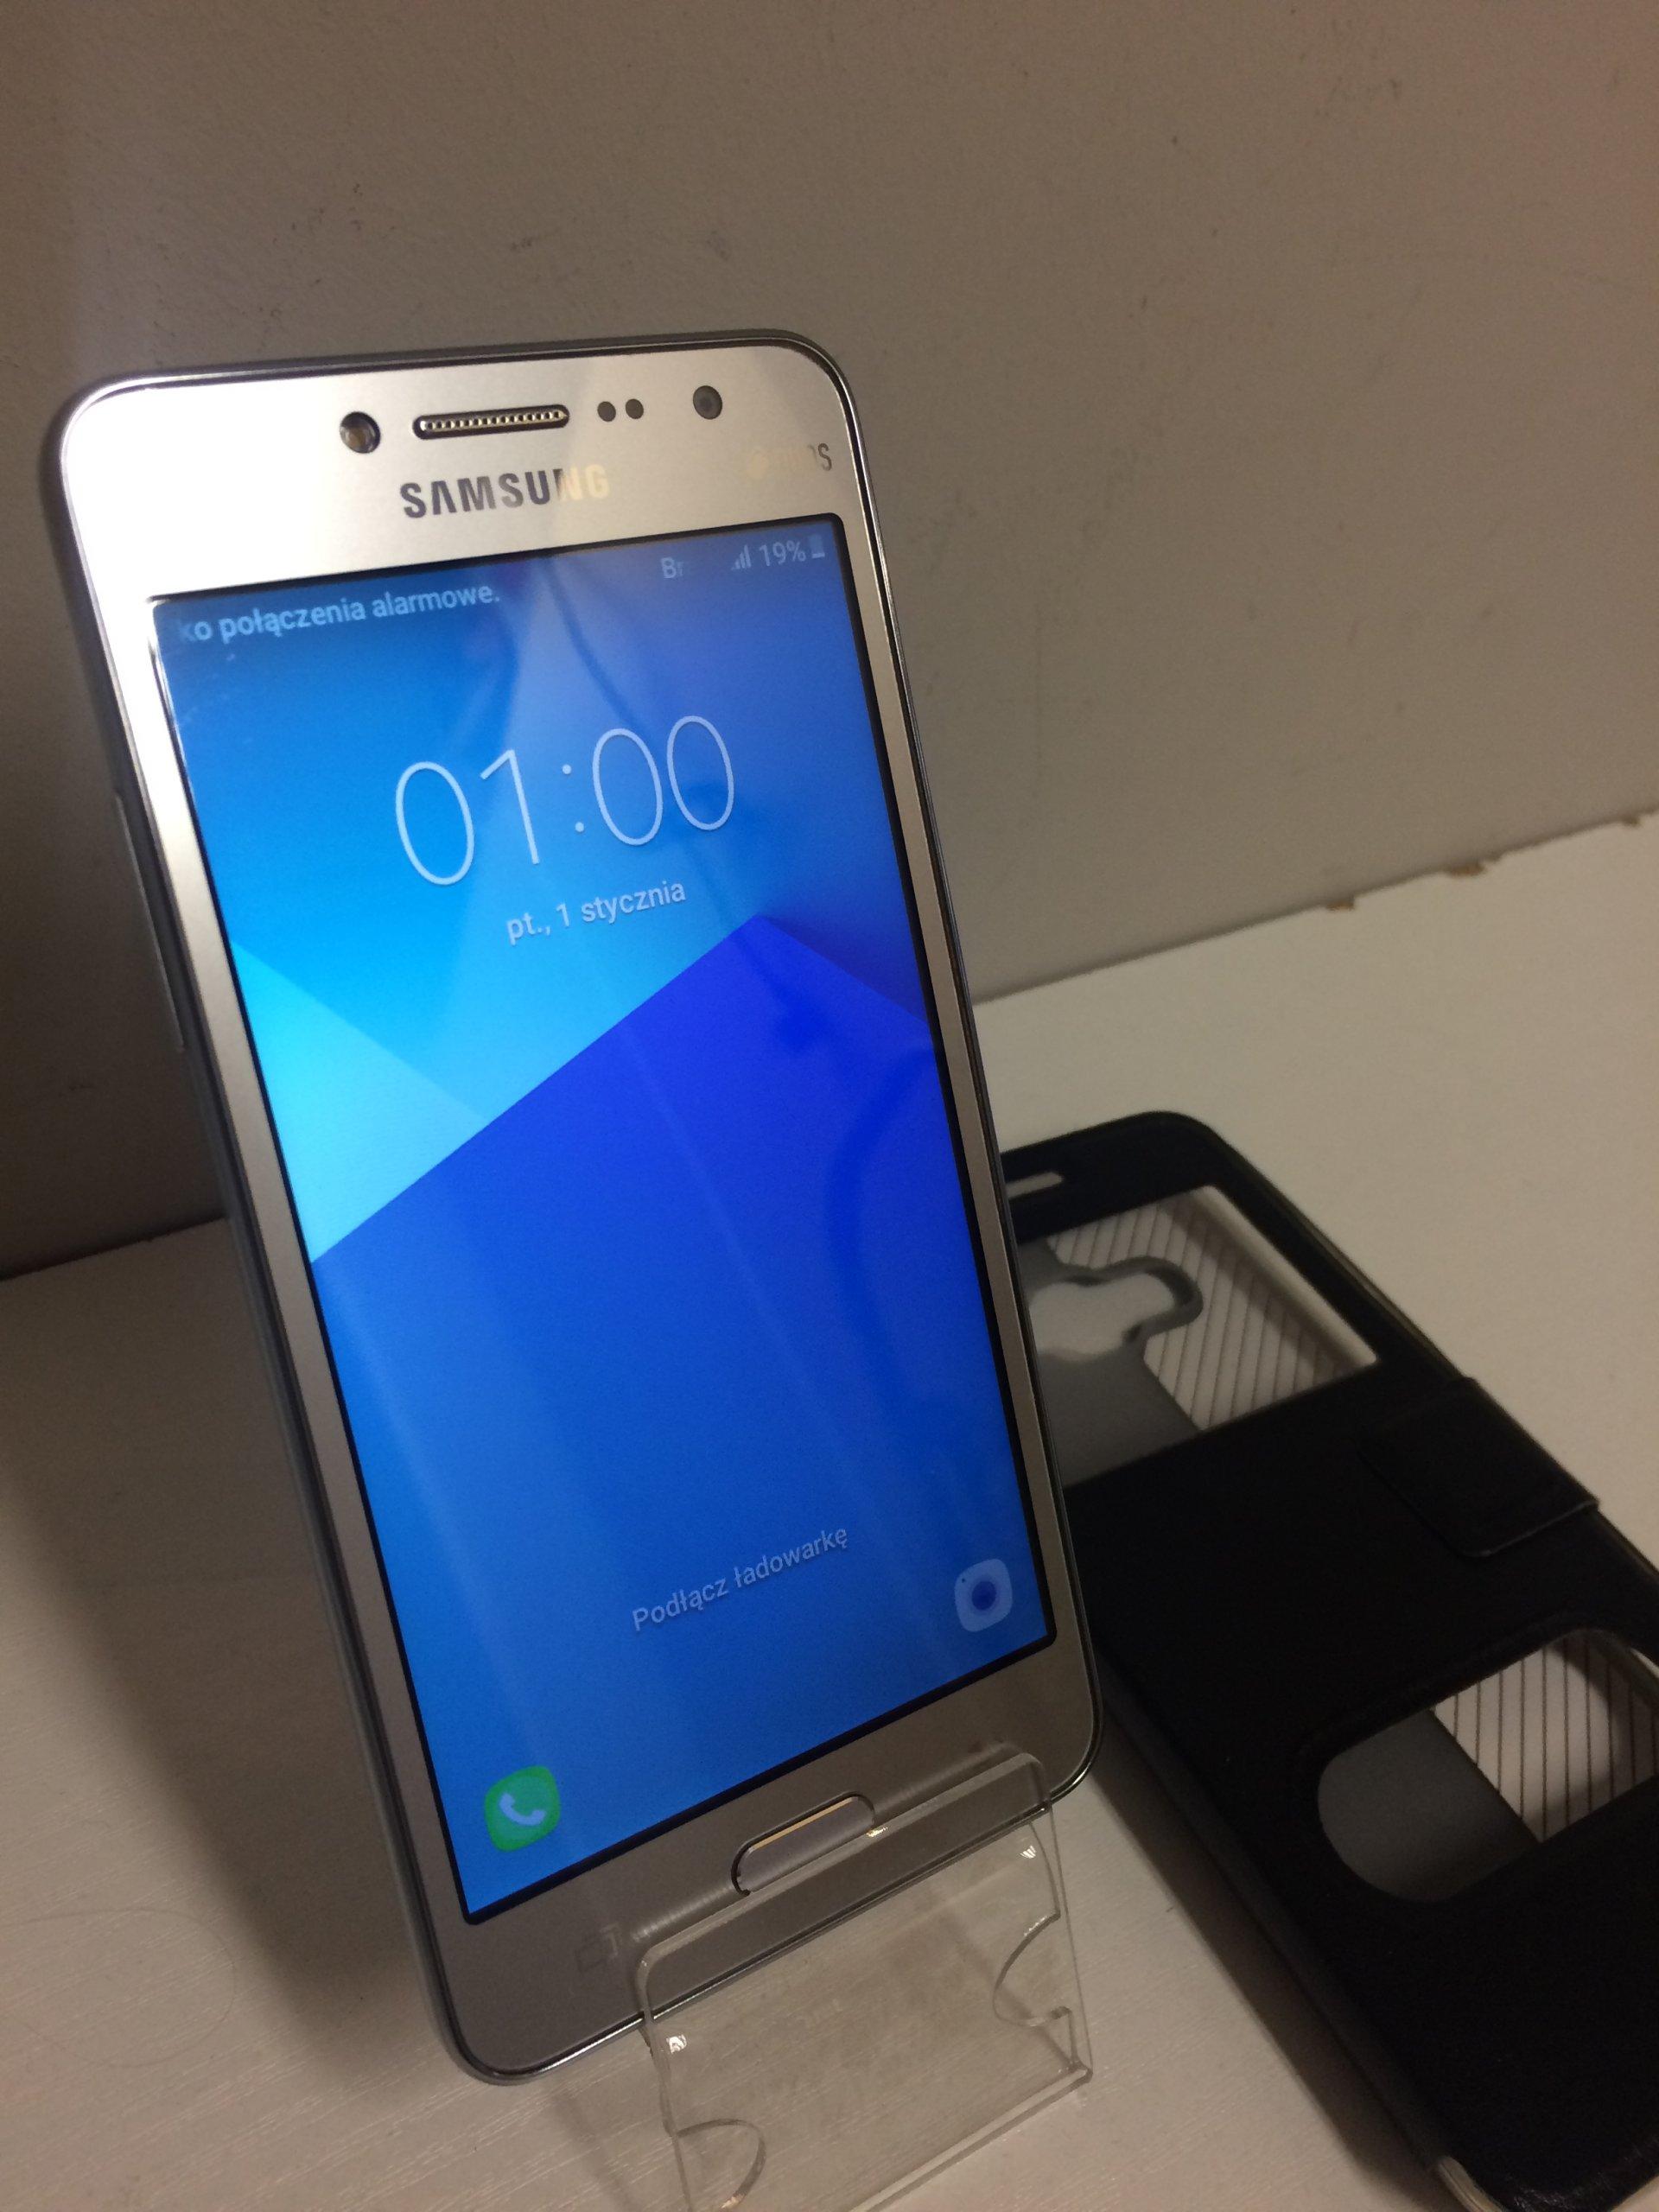 Samsung Galaxy J2 Prime Duos BLOKADA KONTA SAMSUNG